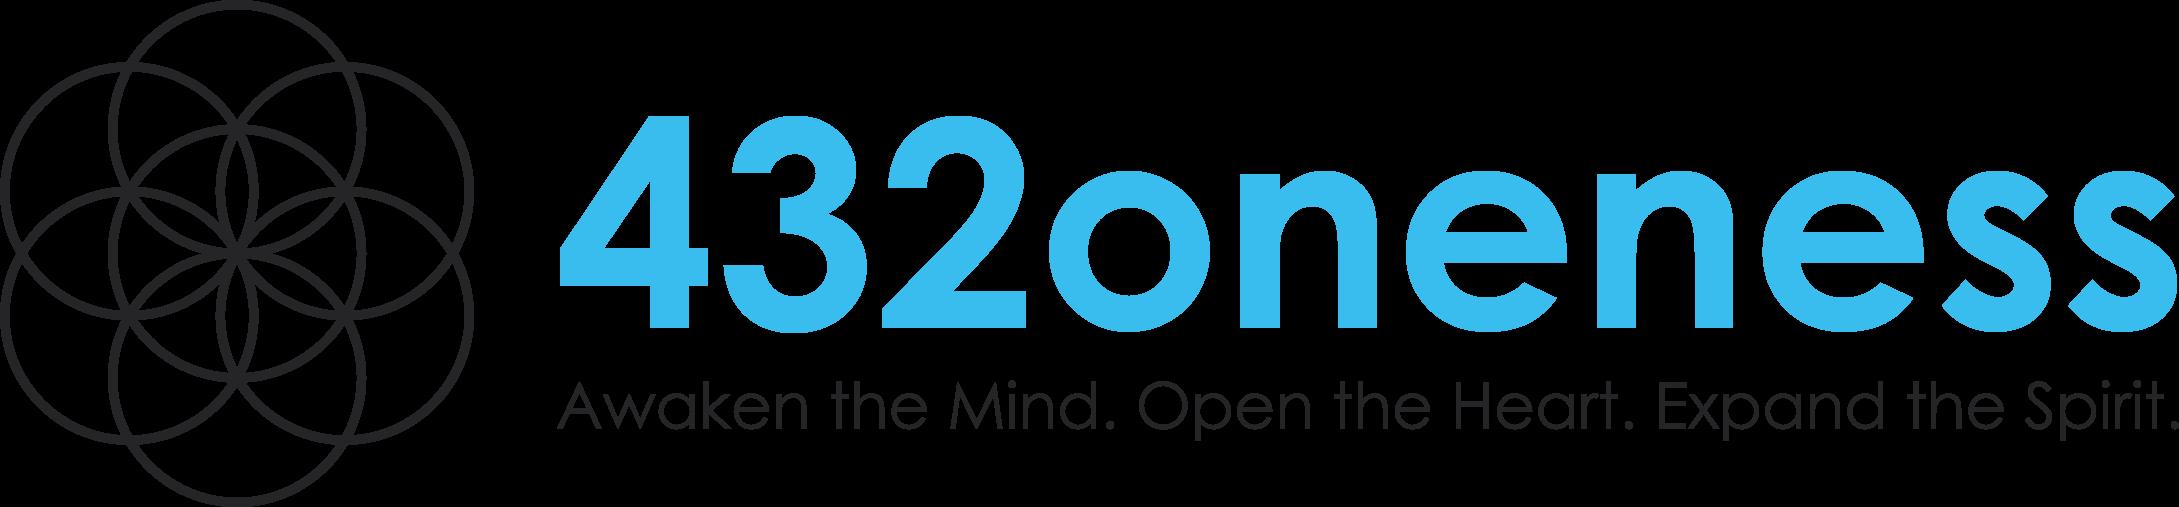 432oneness.com